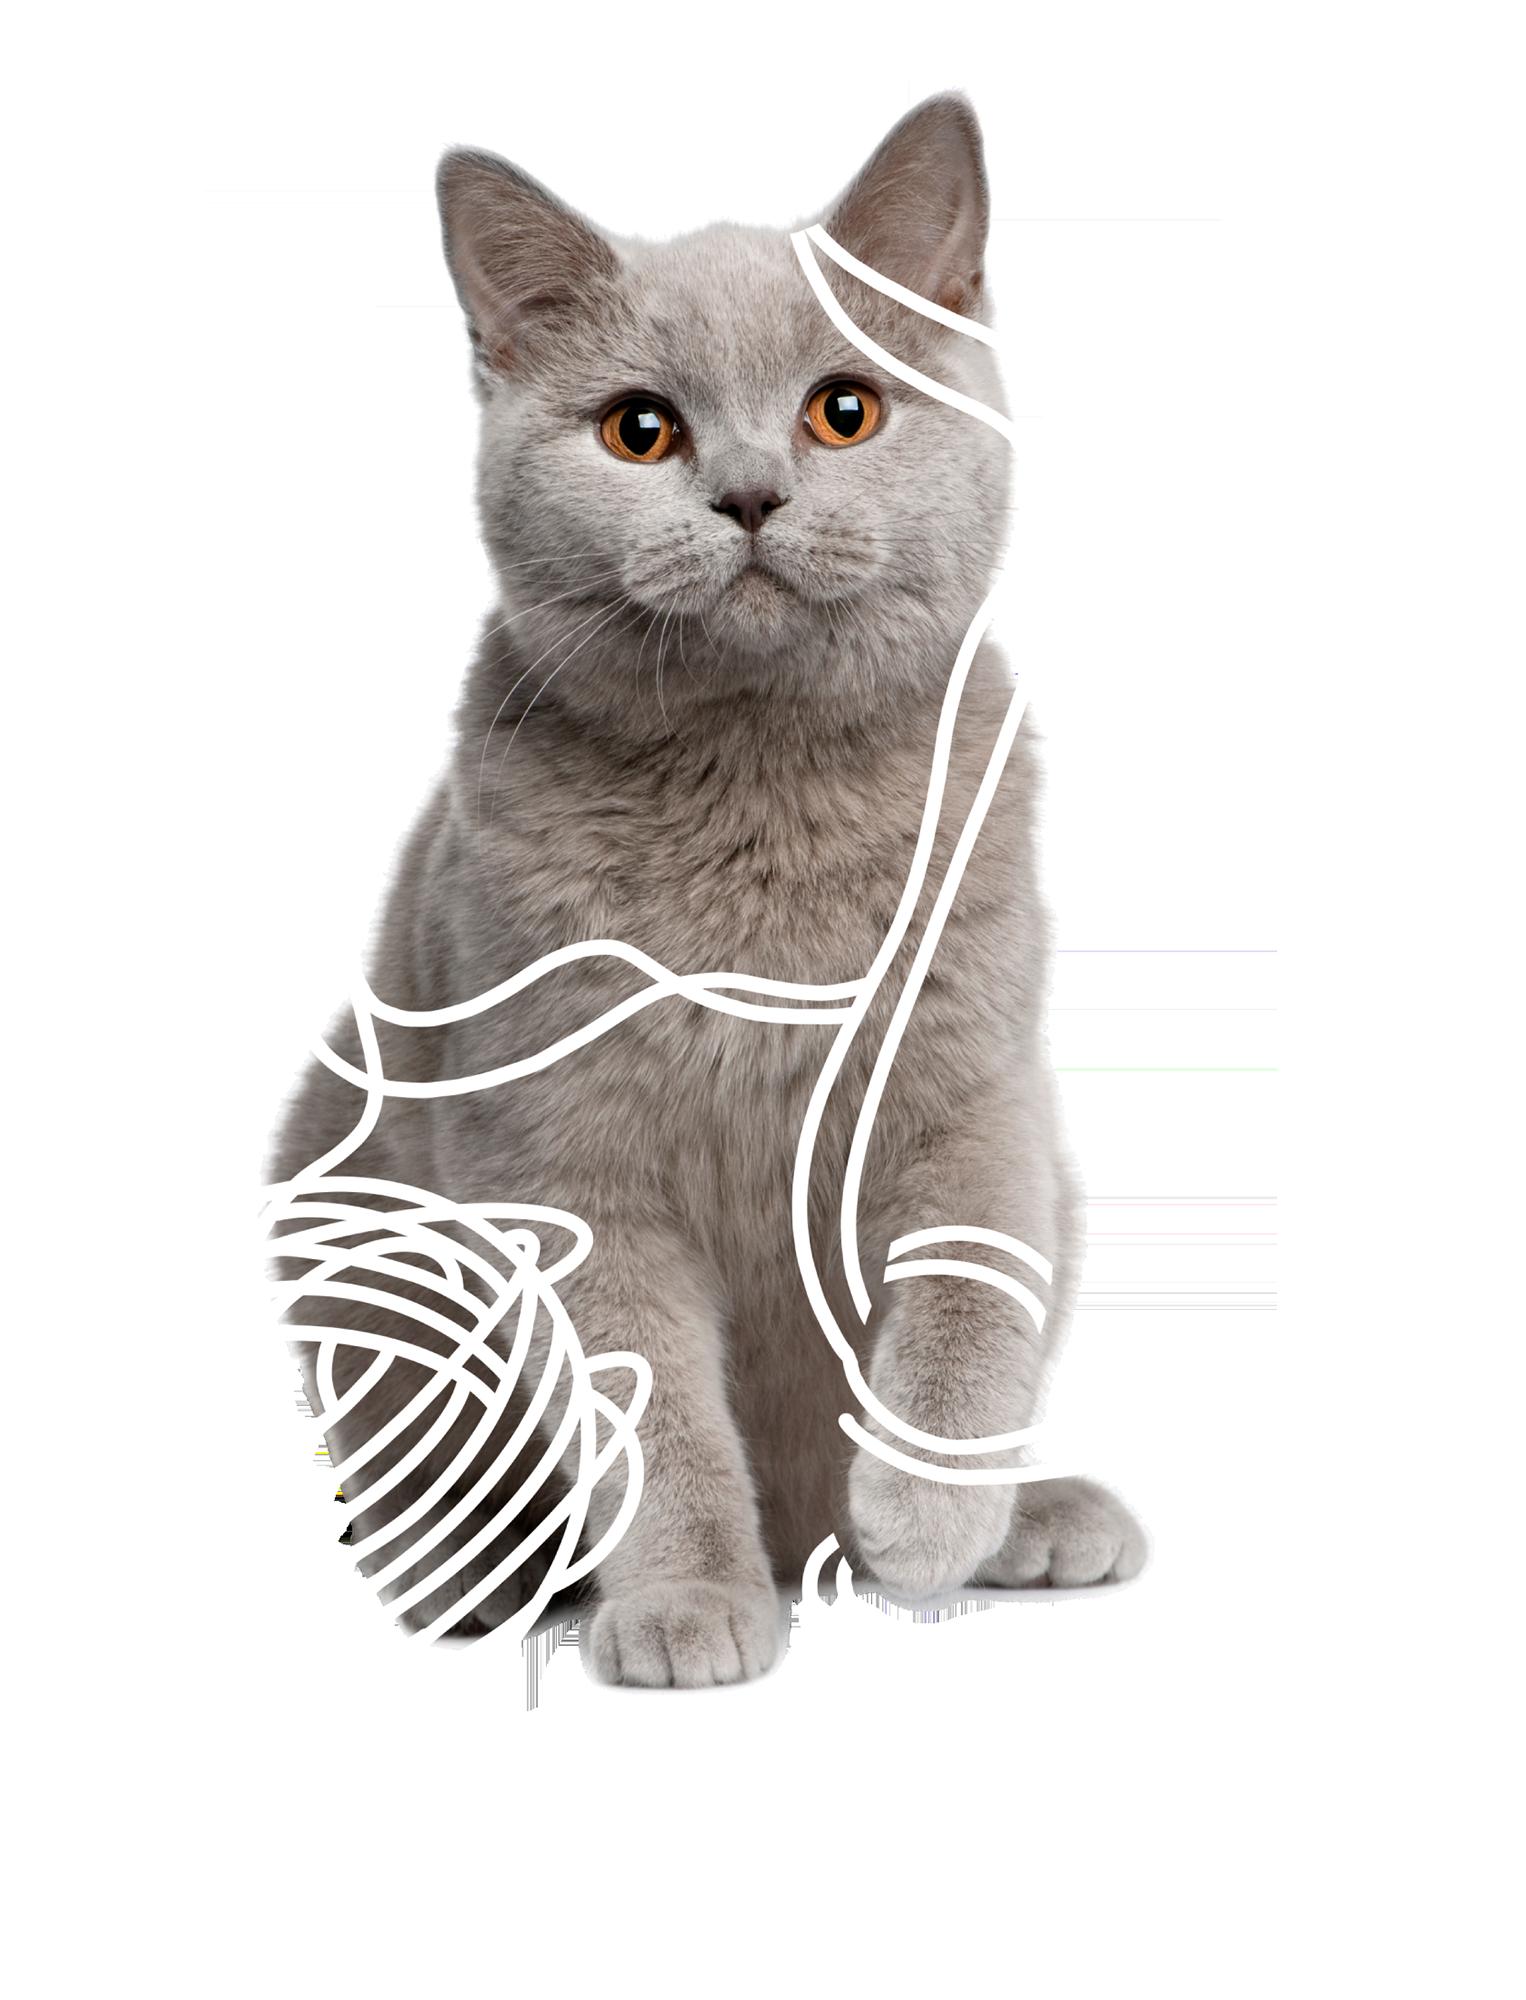 Kitten with Yarn